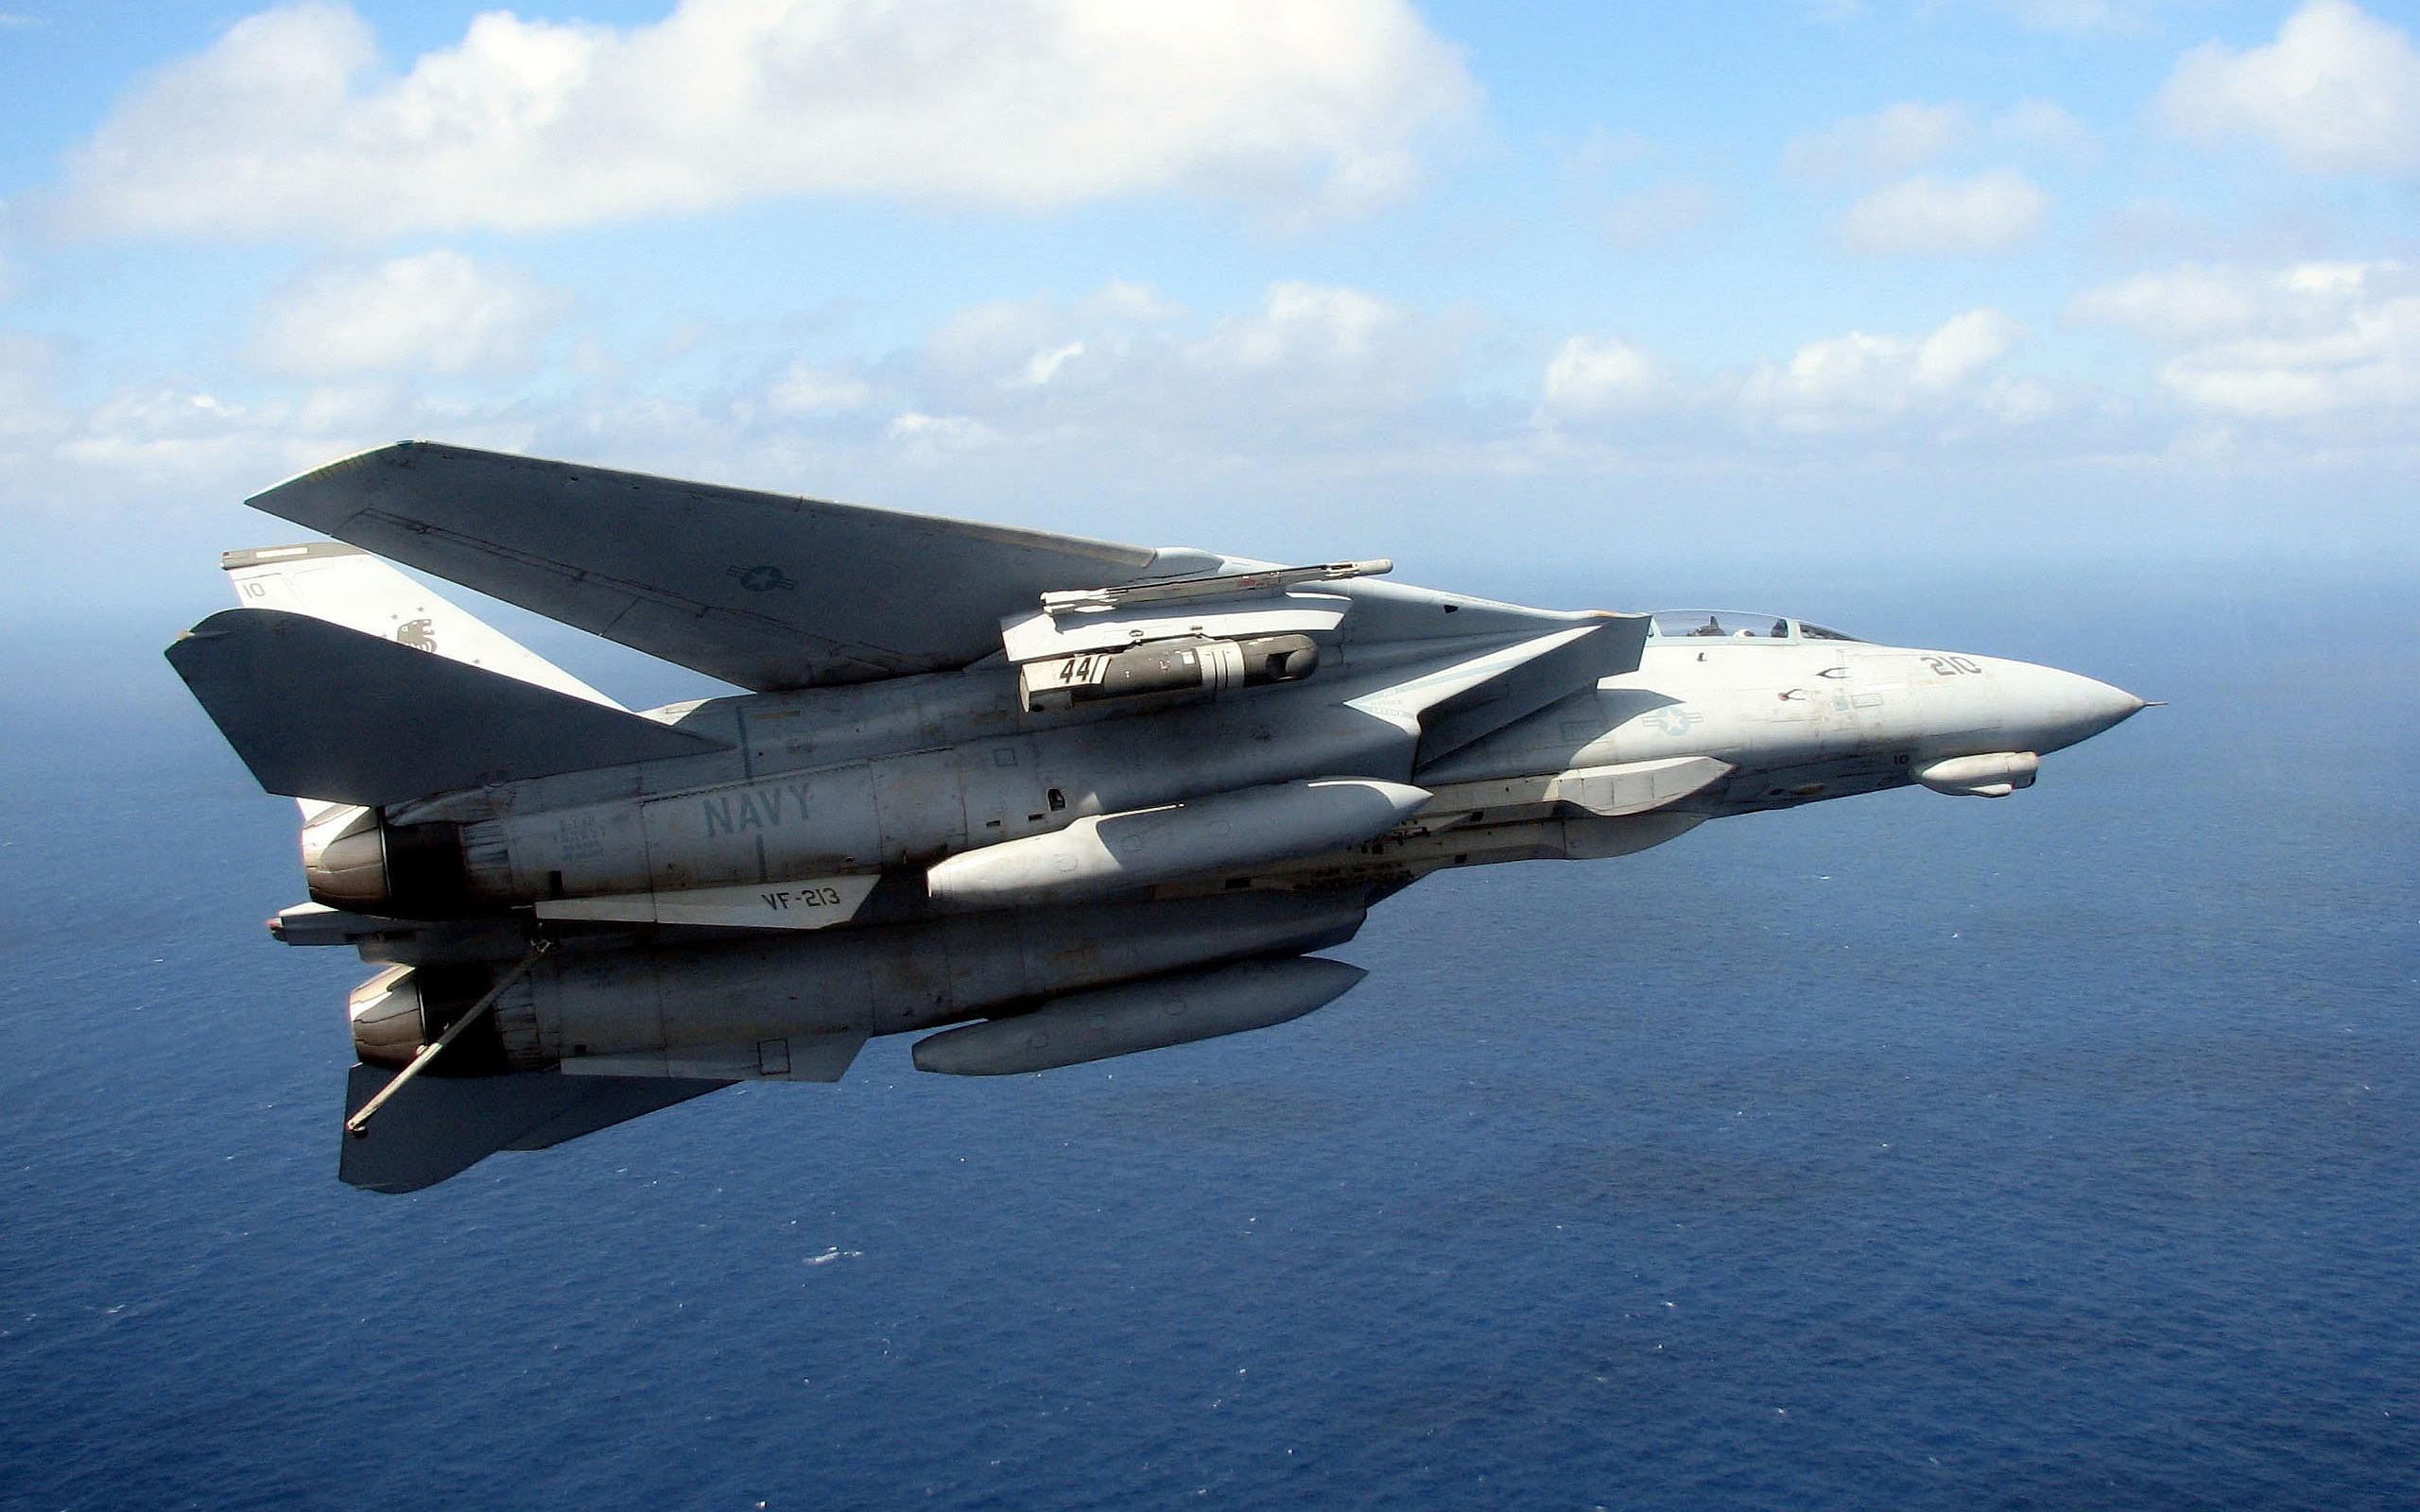 Us Navy F14 Tomcat Wallpaper 2560x1600 34339